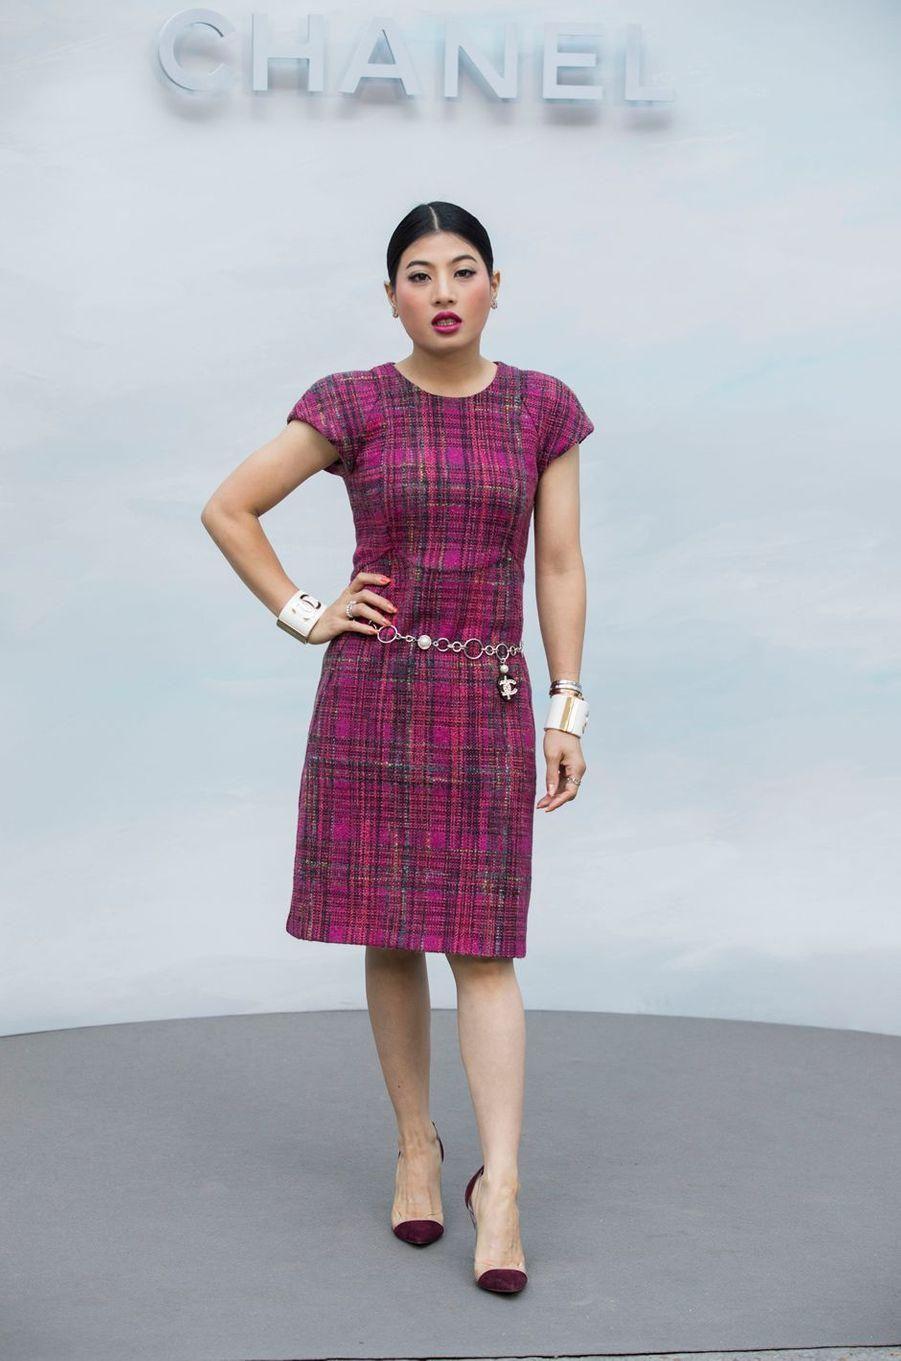 La princesse Sirivannavari Nariratana de Thaïlande à Paris, le 3 juillet 2018